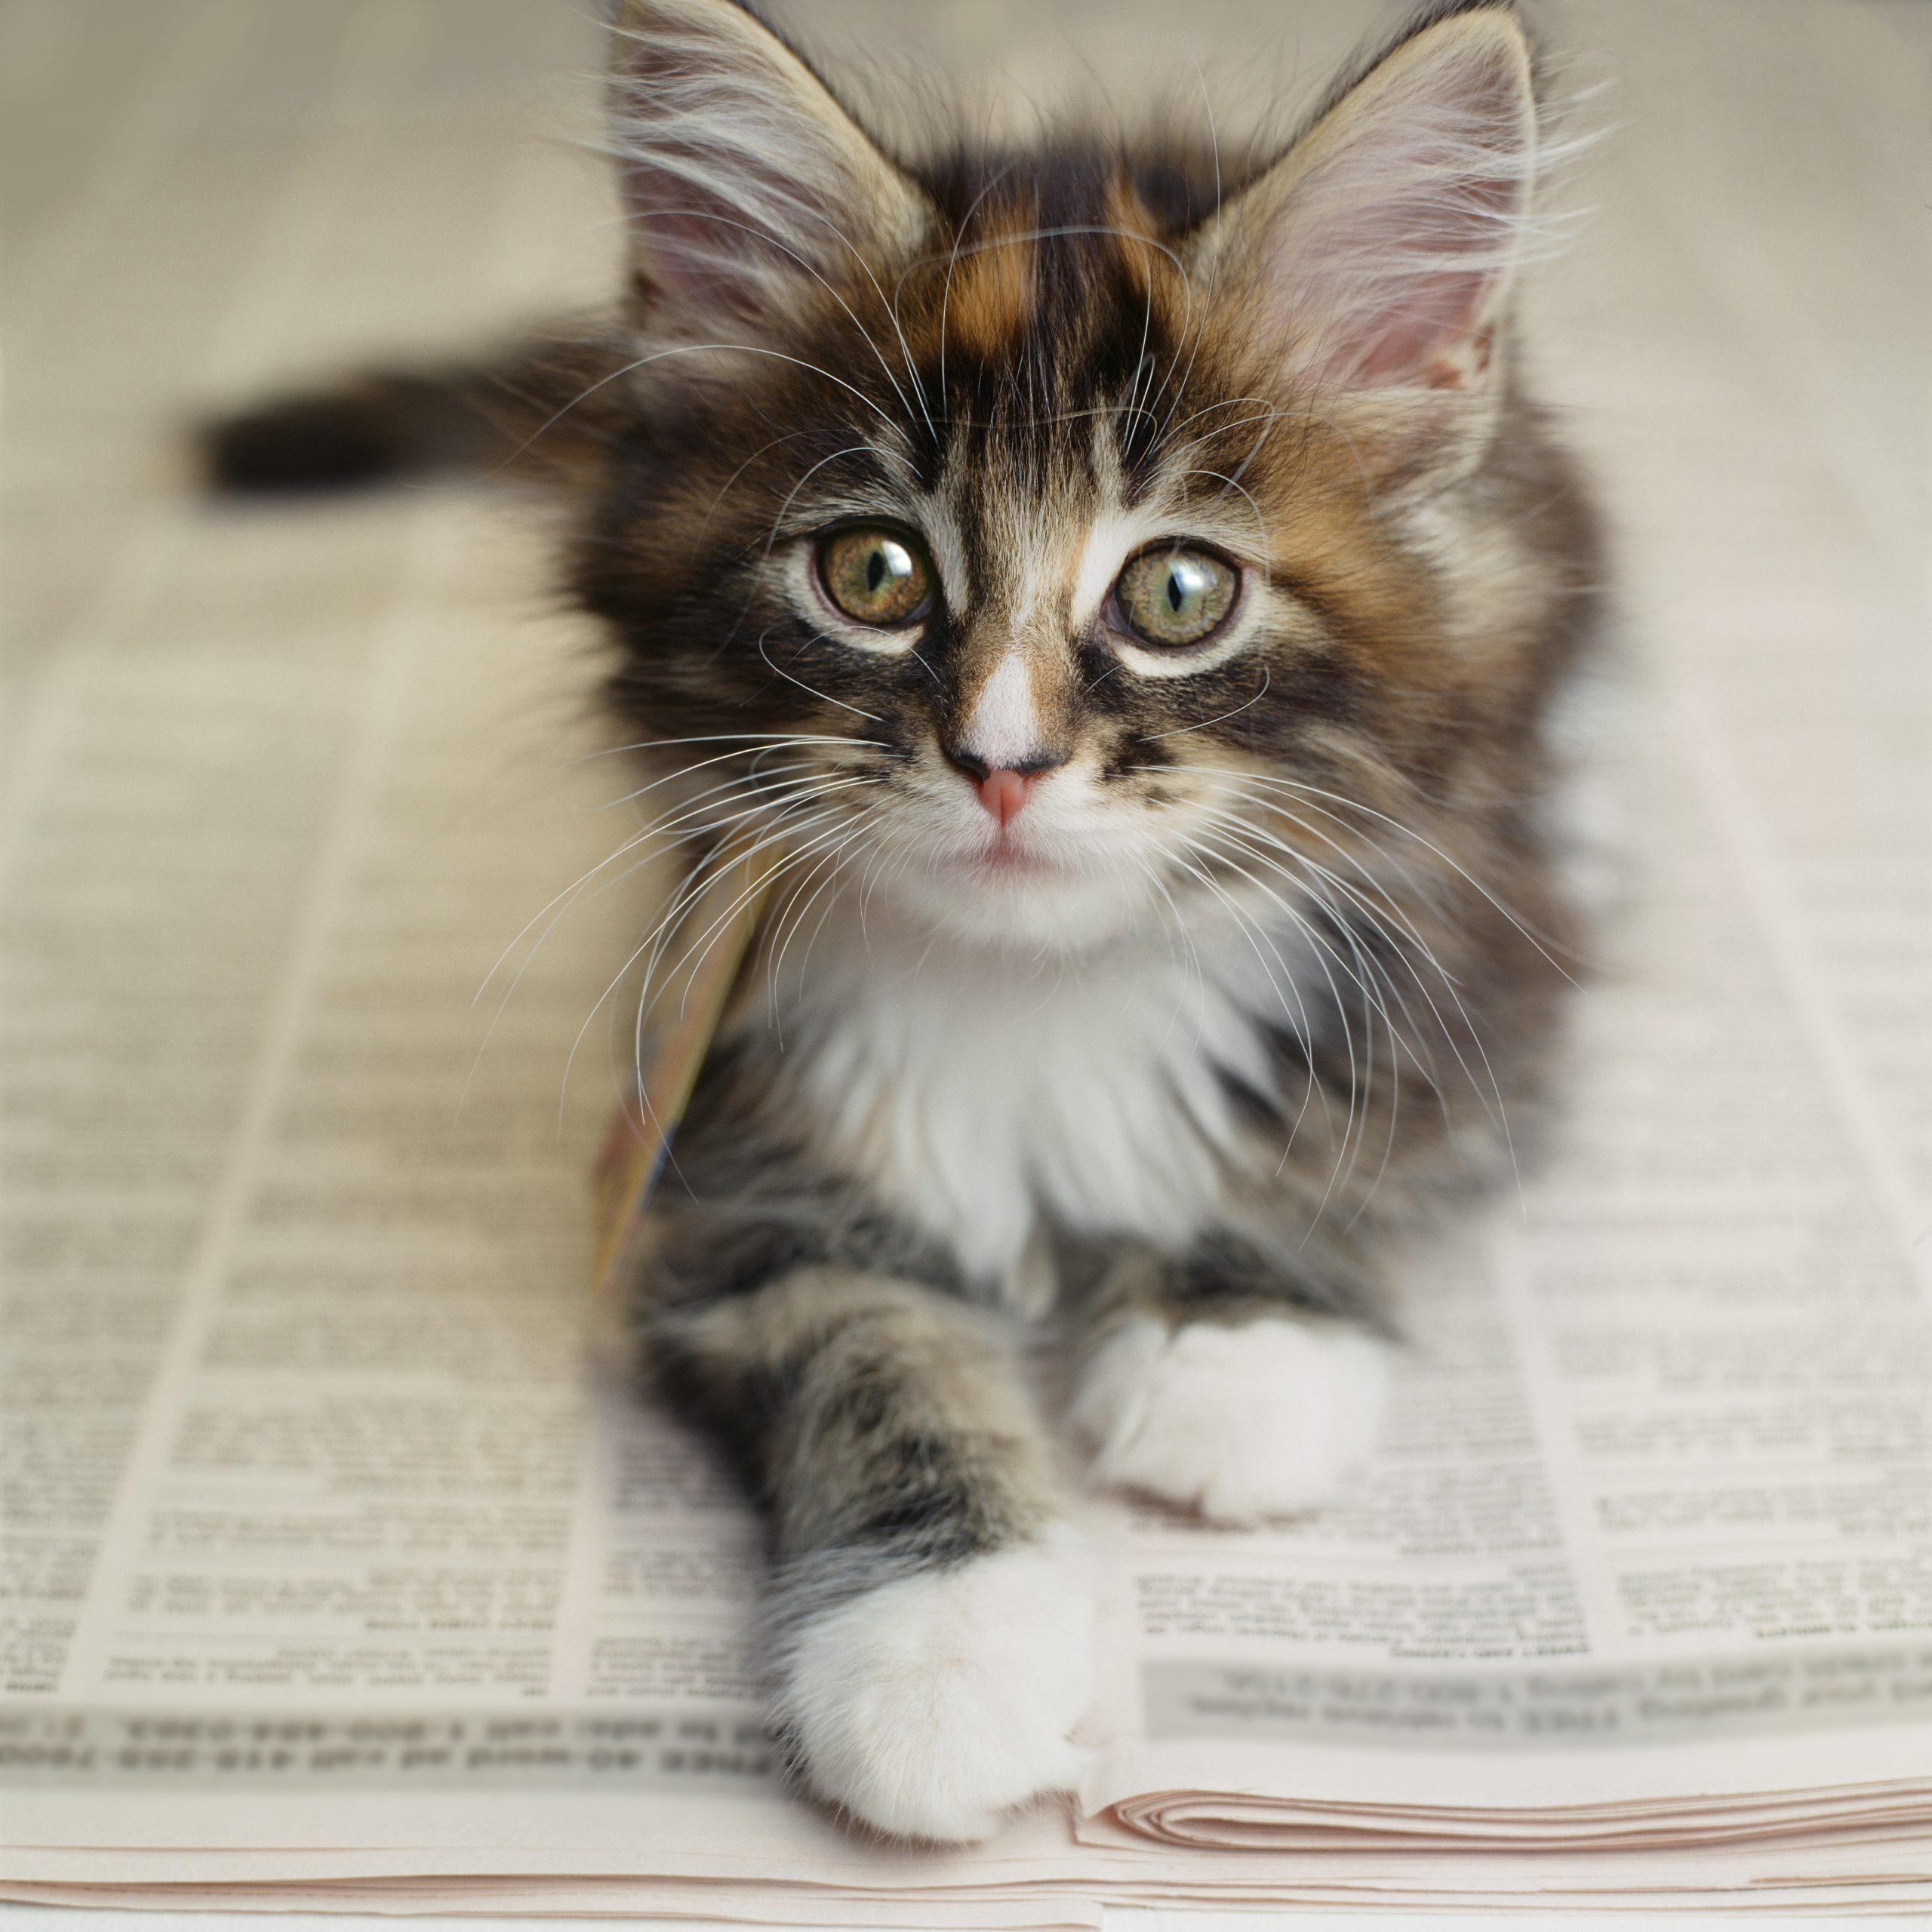 Kitten Laying On Newspaper